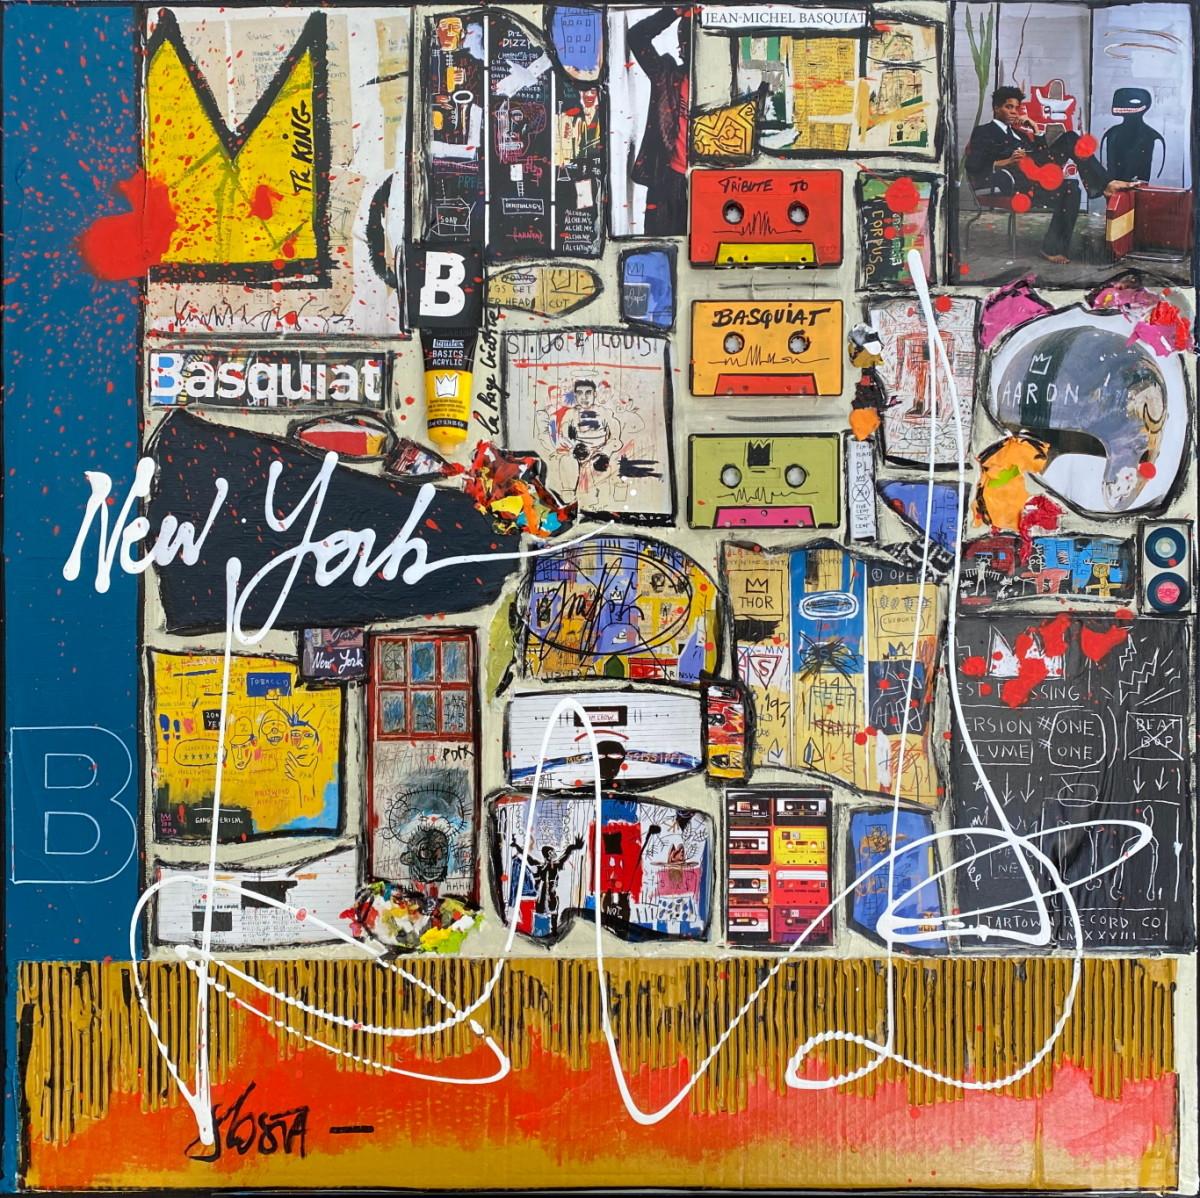 collage, basquiat Tableau Contemporain, Basquiat unlocked. Sophie Costa, artiste peintre.